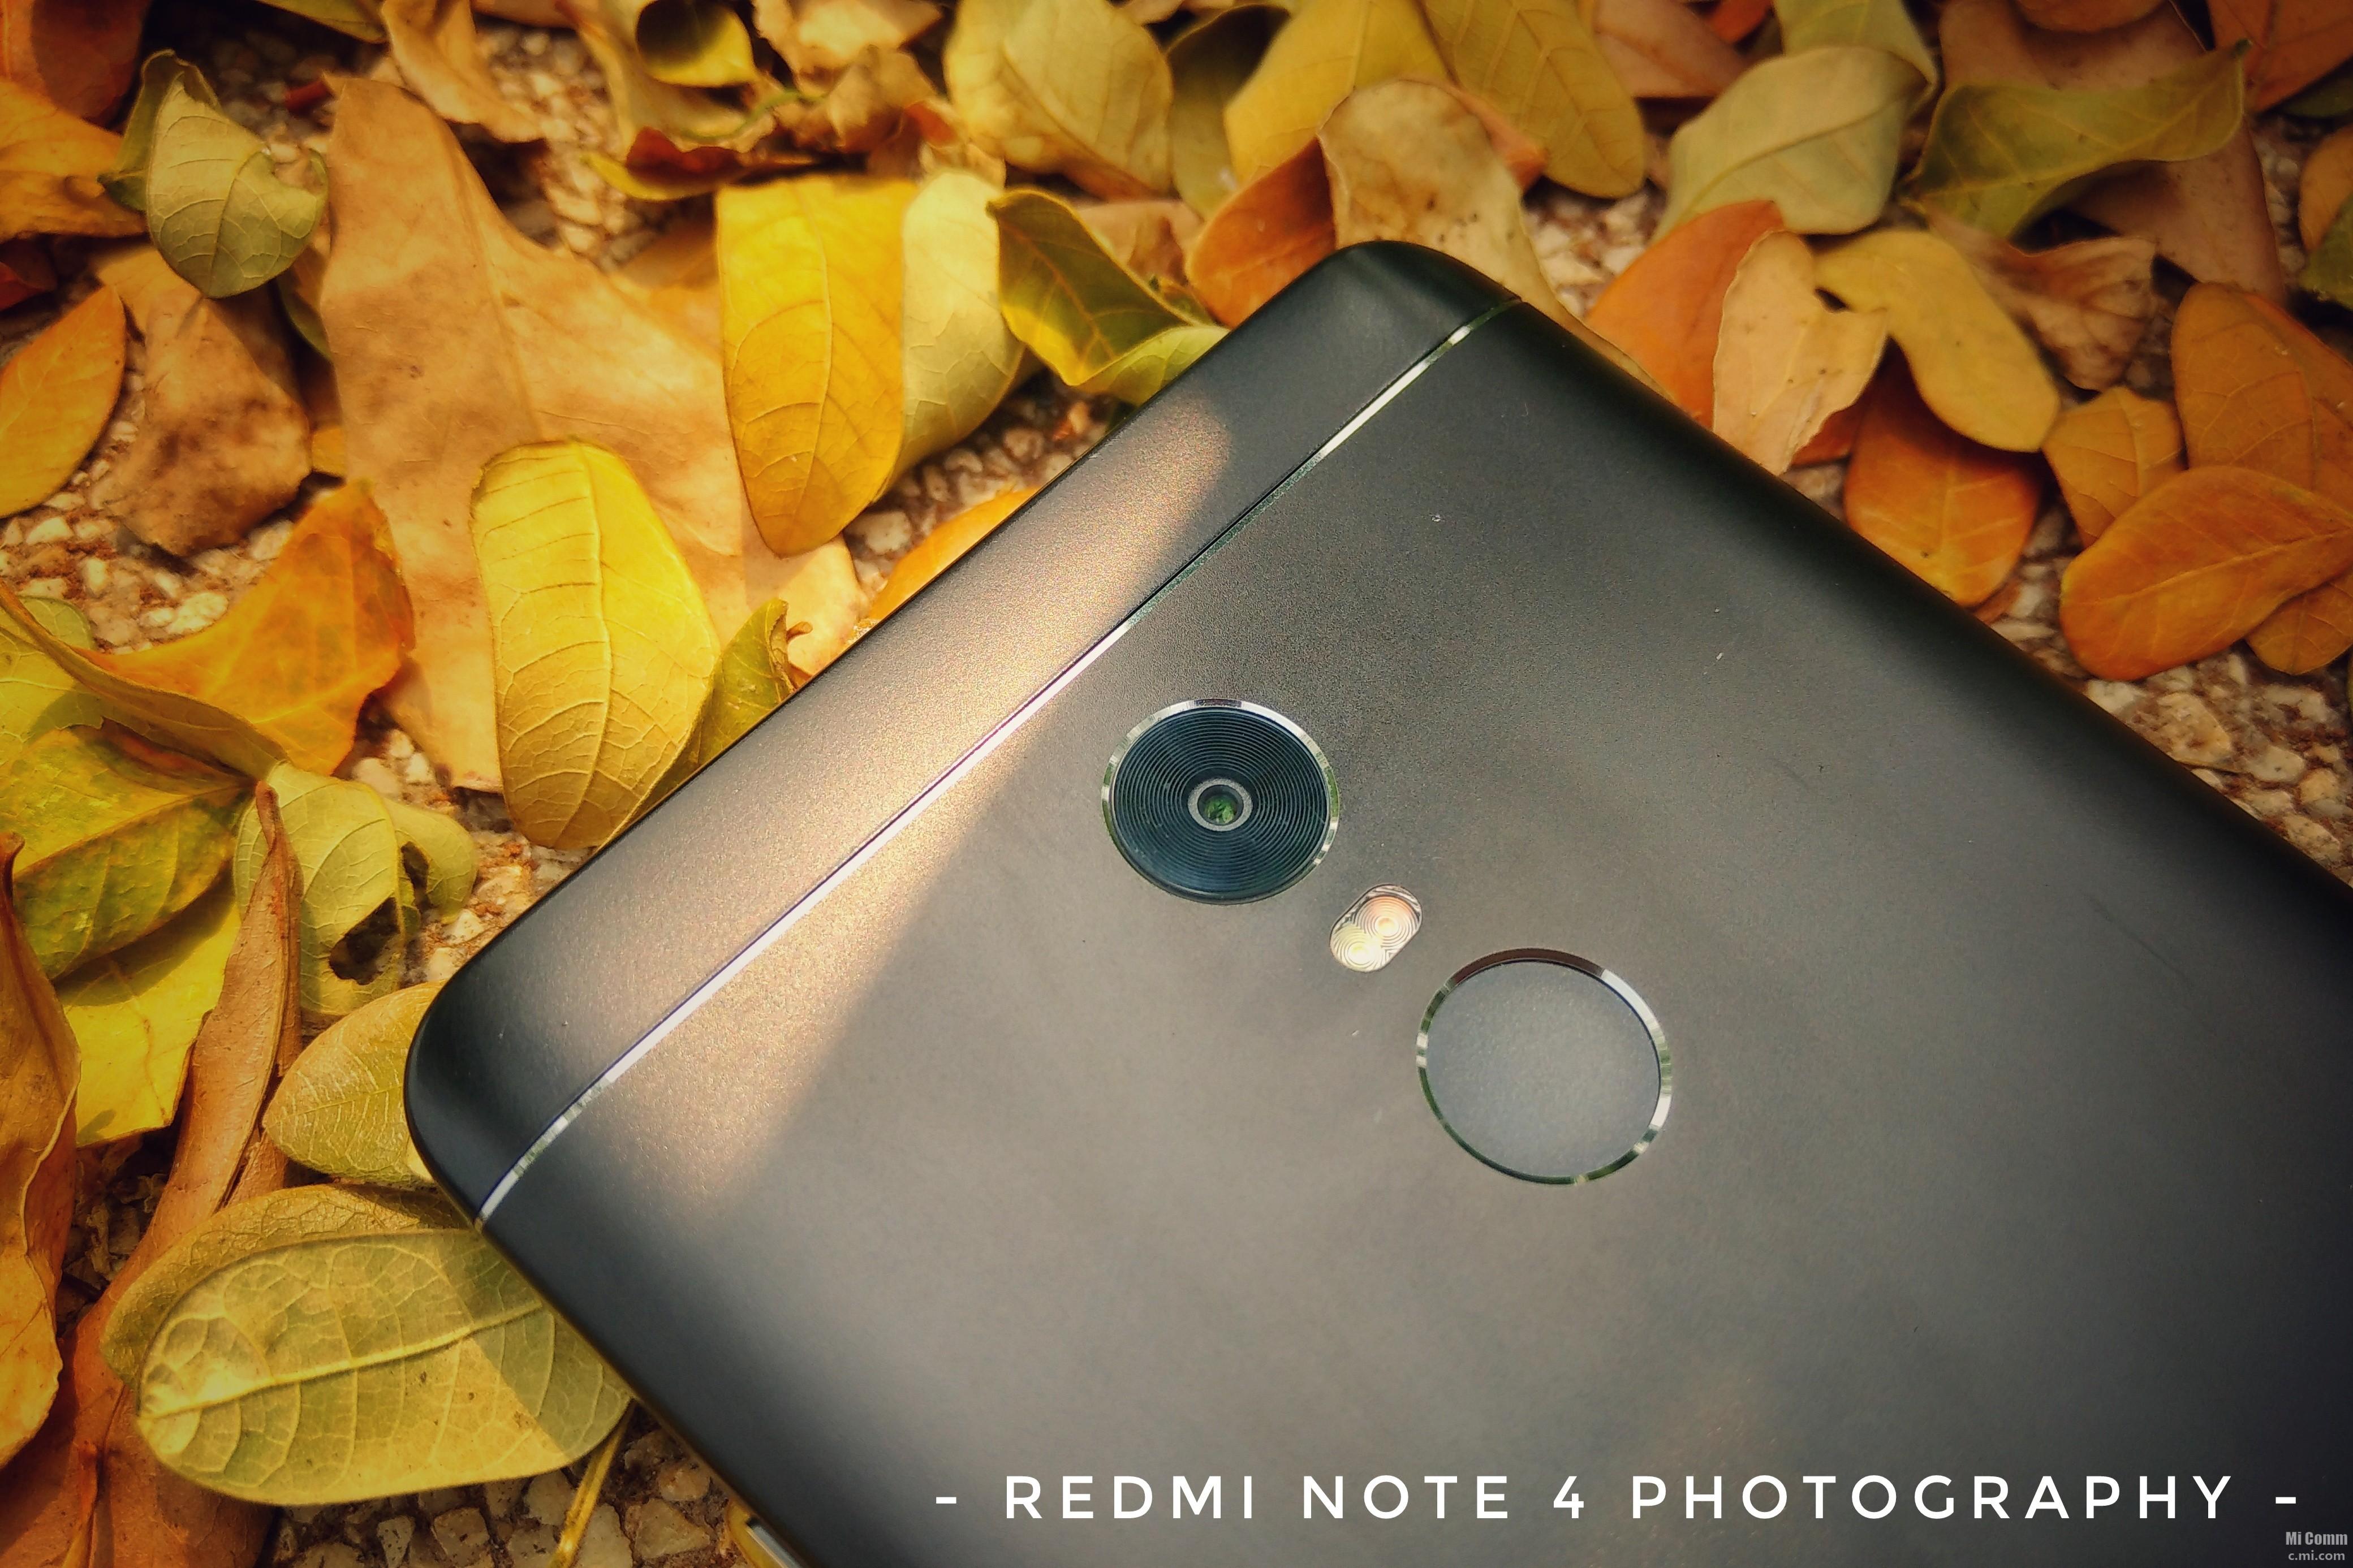 Kumpulan Hasil Foto Redmi Note 4